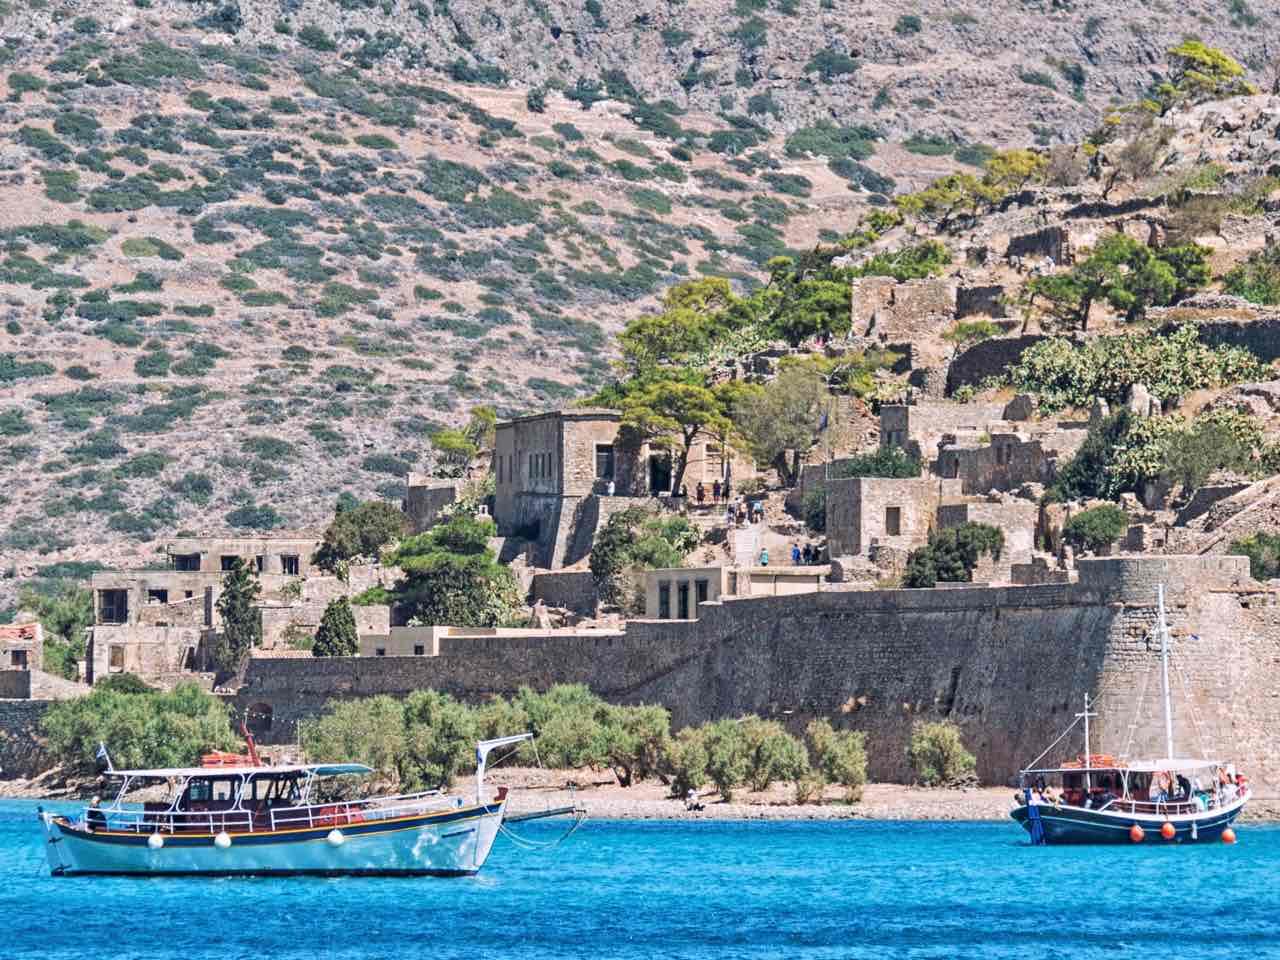 Crete and Spinalonga Island